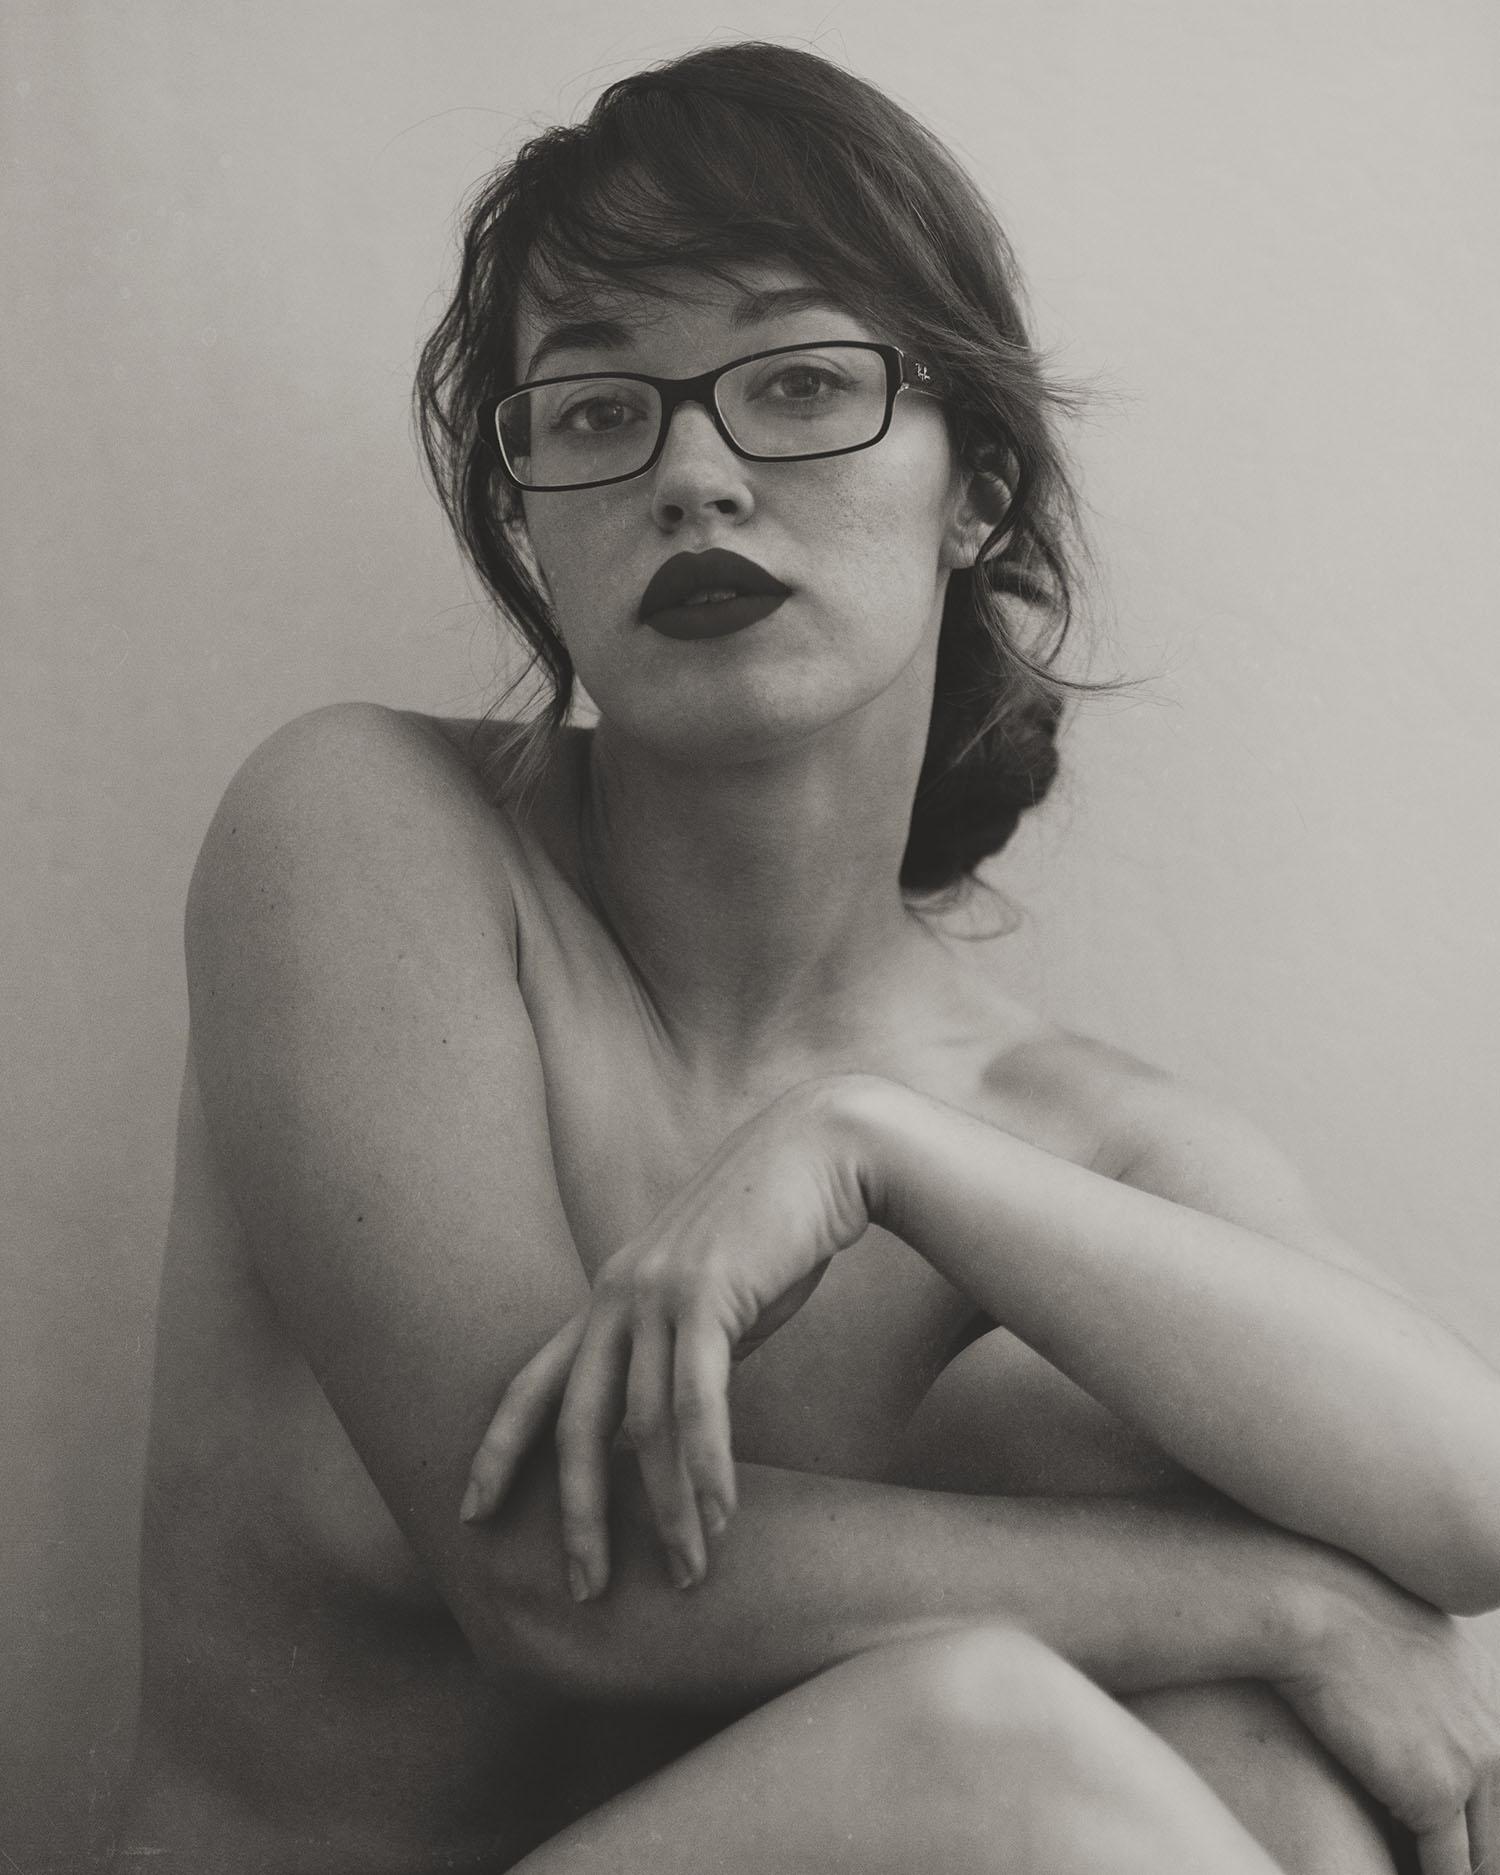 Emily Joy Wilson Photography 22, 2 43 05 AM.jpg